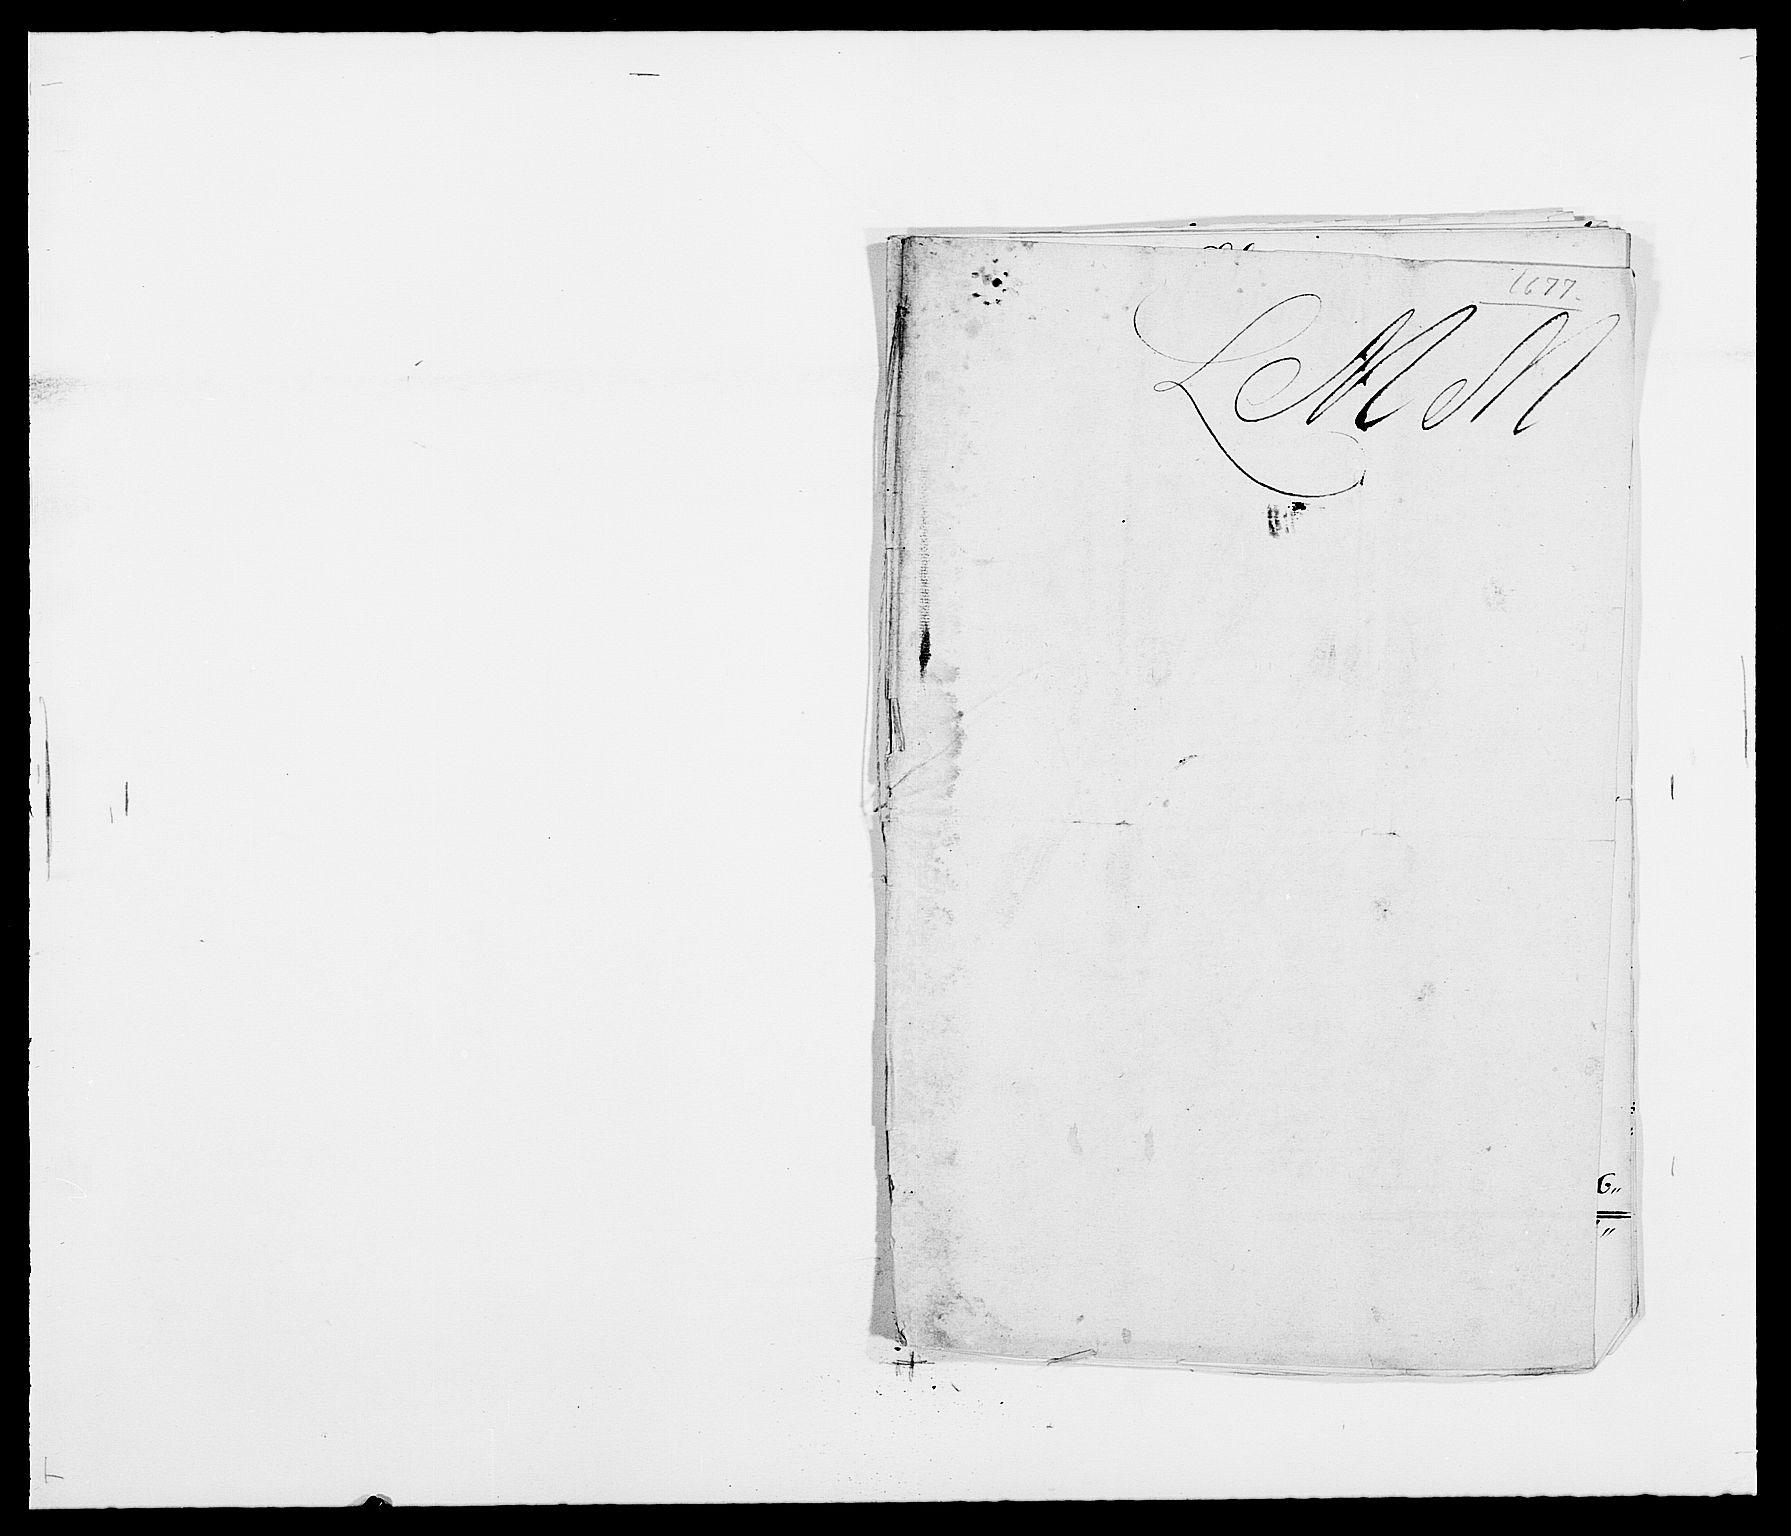 RA, Rentekammeret inntil 1814, Reviderte regnskaper, Fogderegnskap, R32/L1845: Fogderegnskap Jarlsberg grevskap, 1676-1678, s. 307